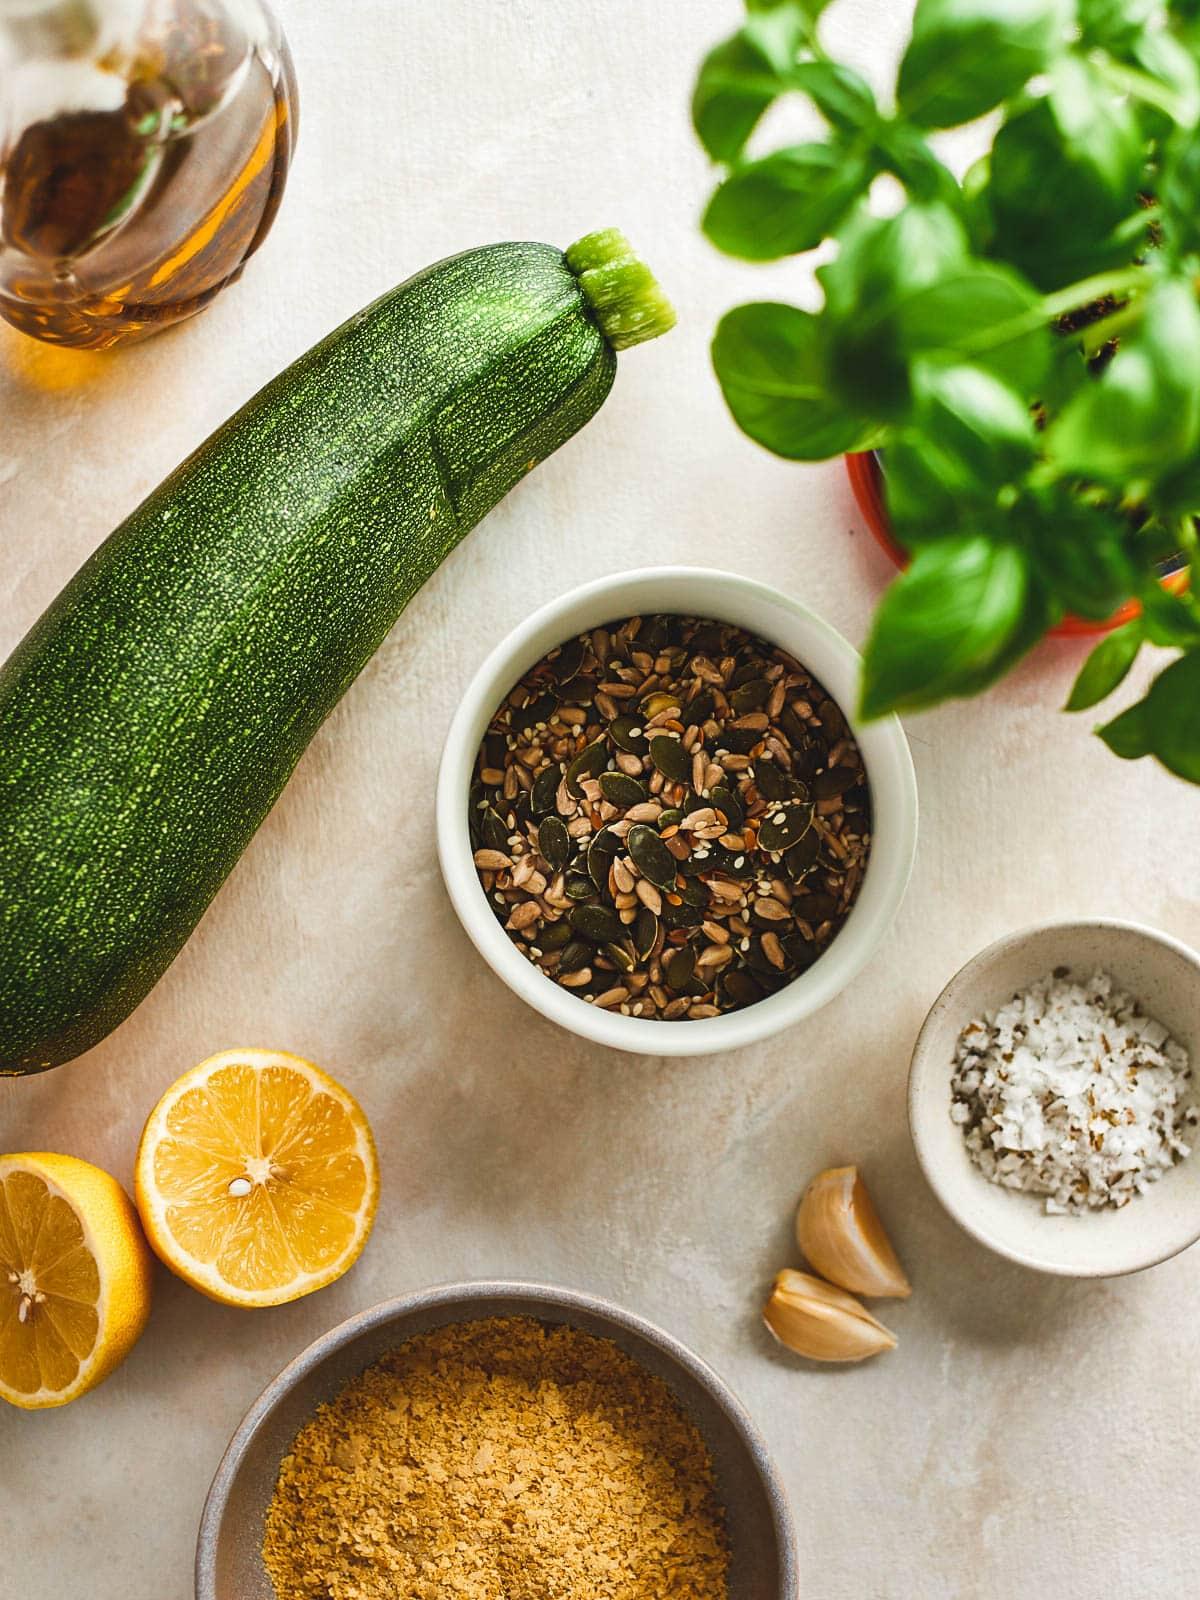 Ingredients for zucchini pesto